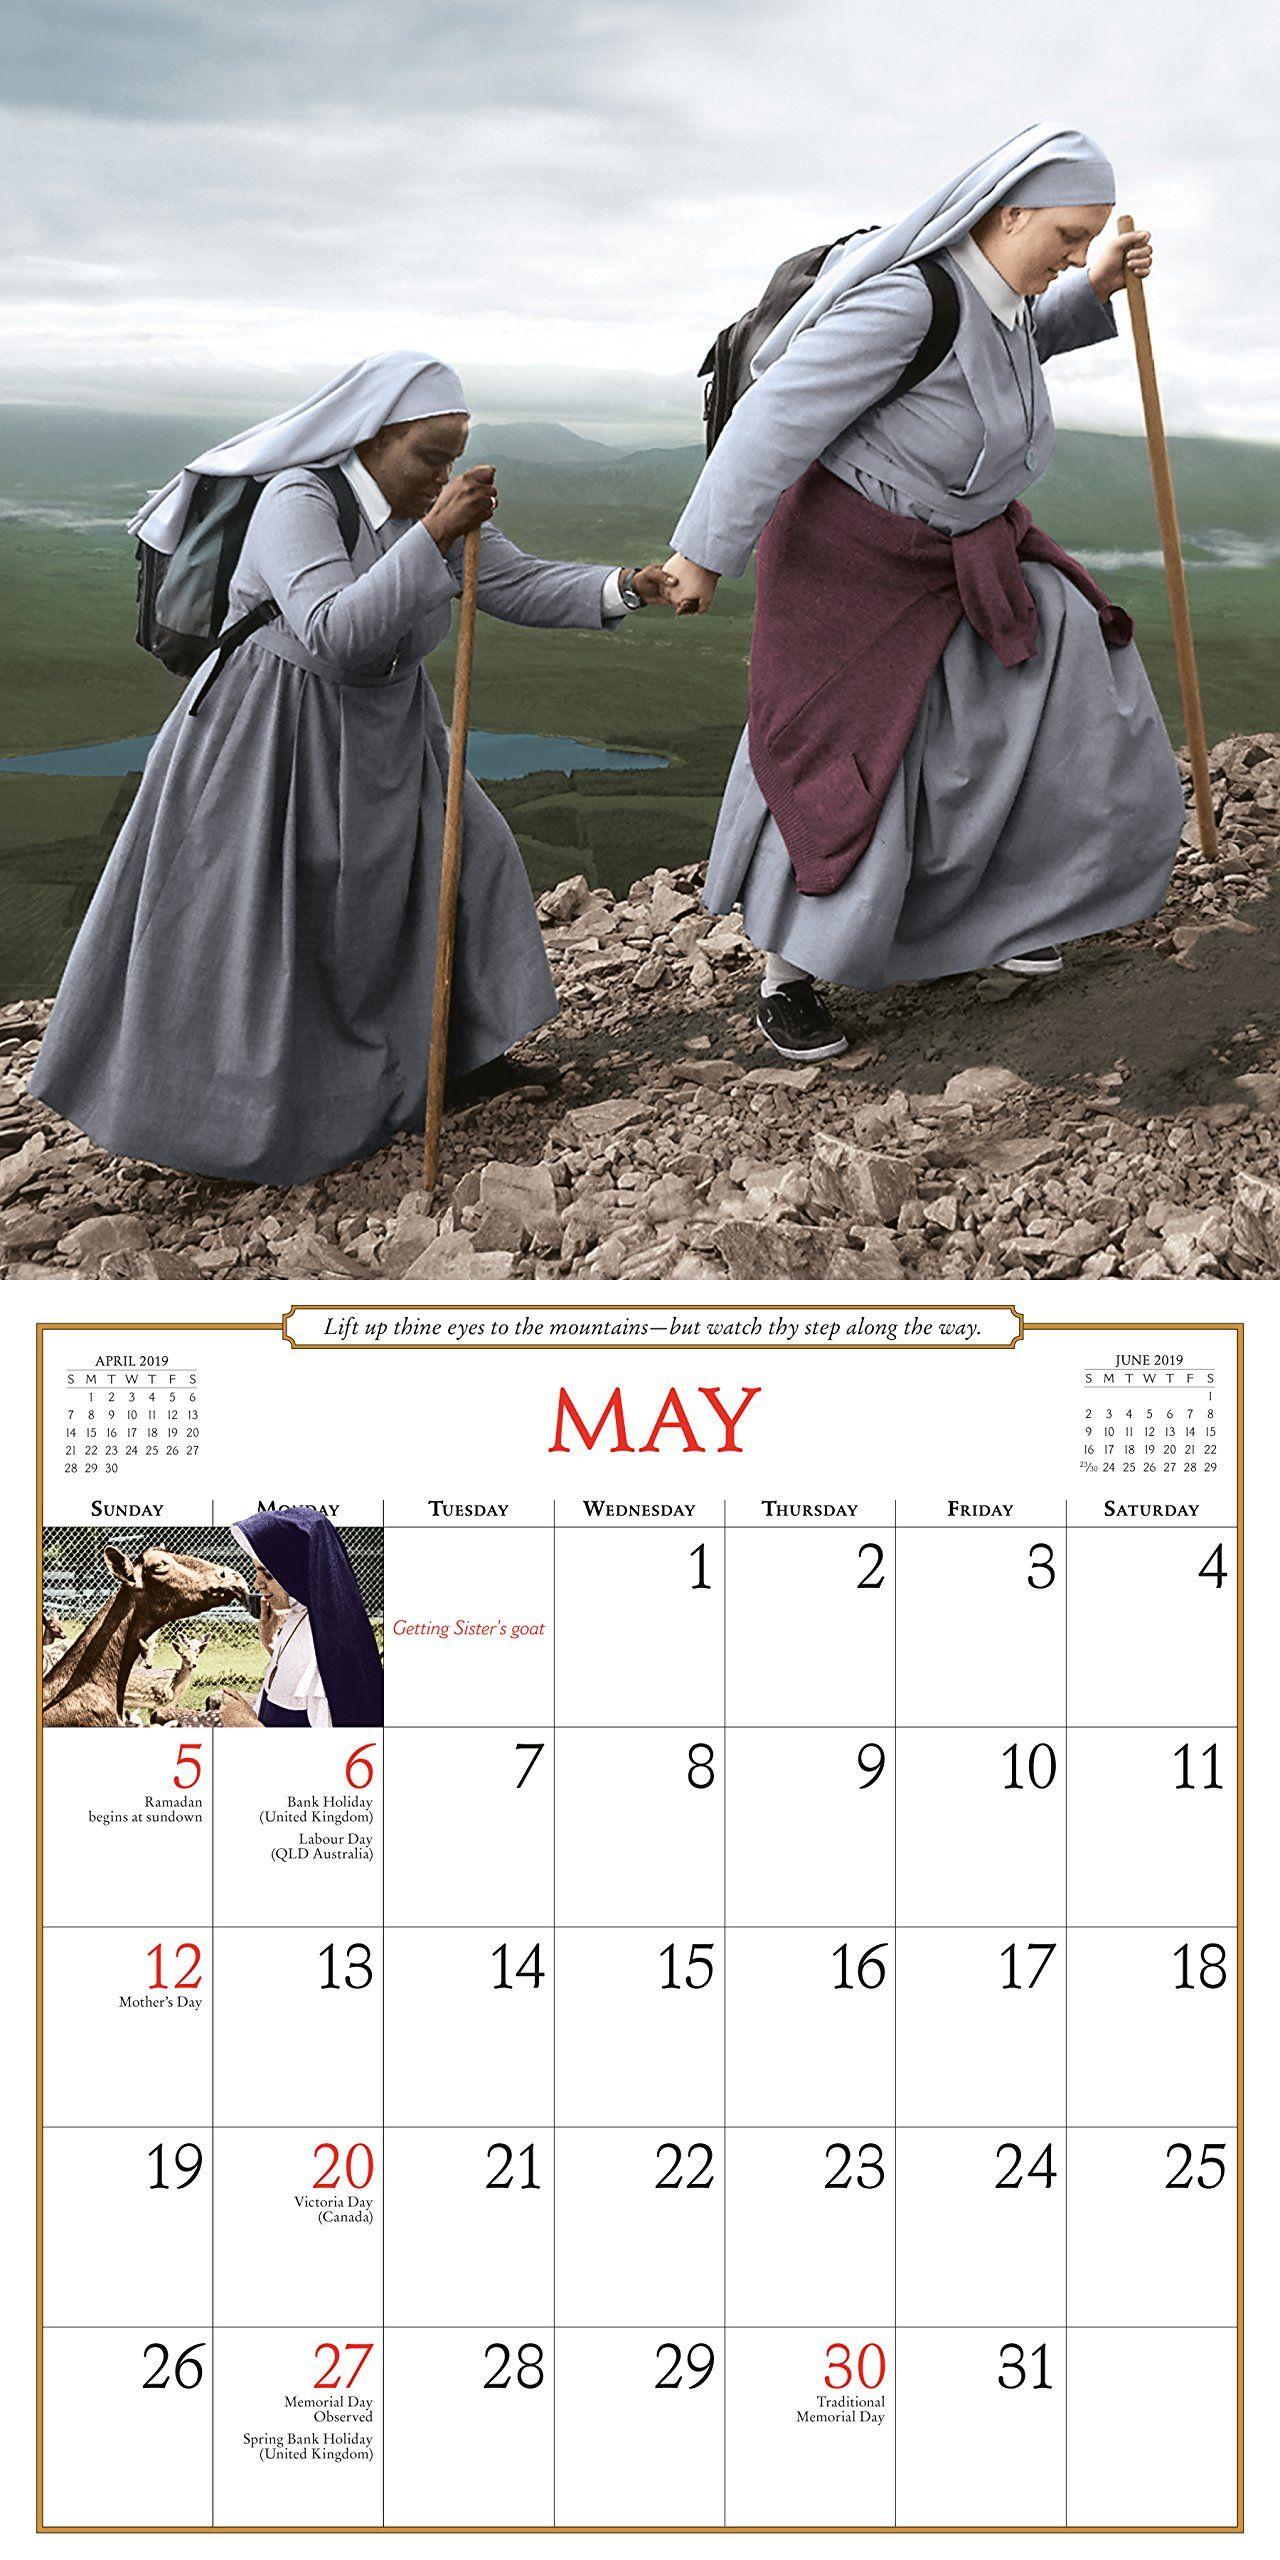 Nuns Having Fun Wall Calendar 2019 Calendar Wall Calendar July 10 2018 Wall Calendar Nuns Fun Wall Calendar Have Fun Fun